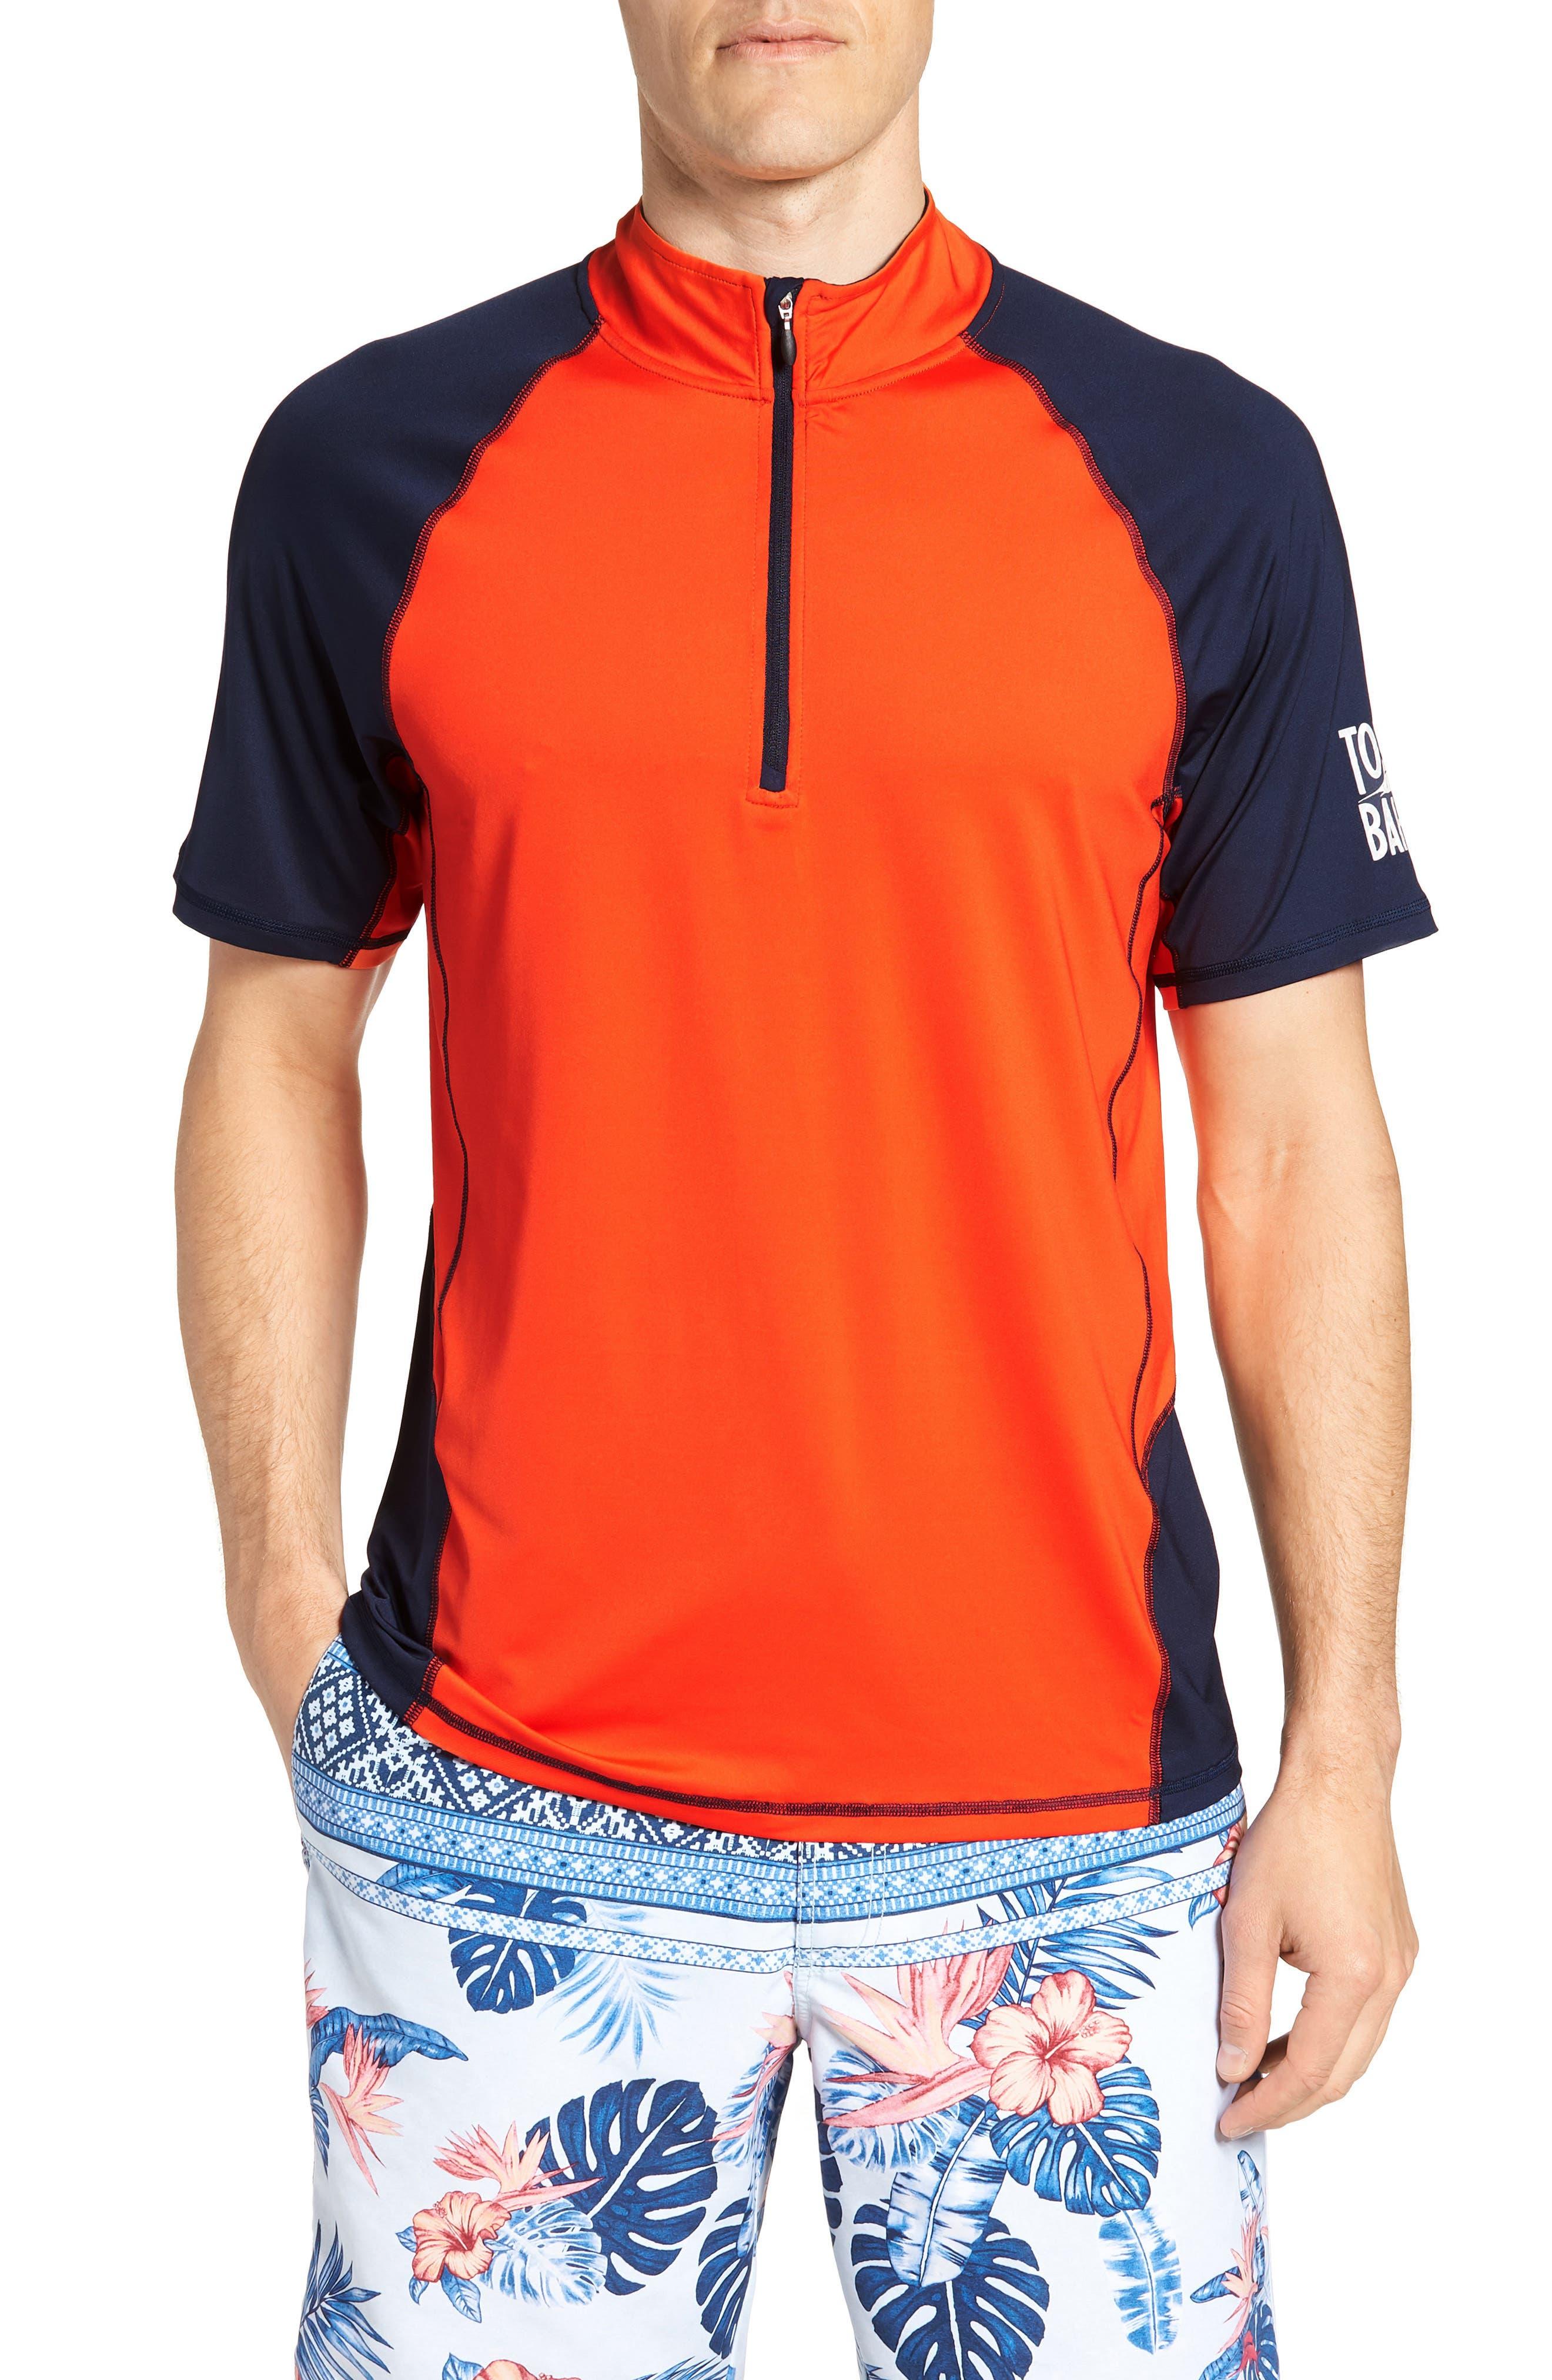 IslandActive<sup>™</sup> Colorblock Beach Pro Rashguard T-Shirt,                             Main thumbnail 2, color,